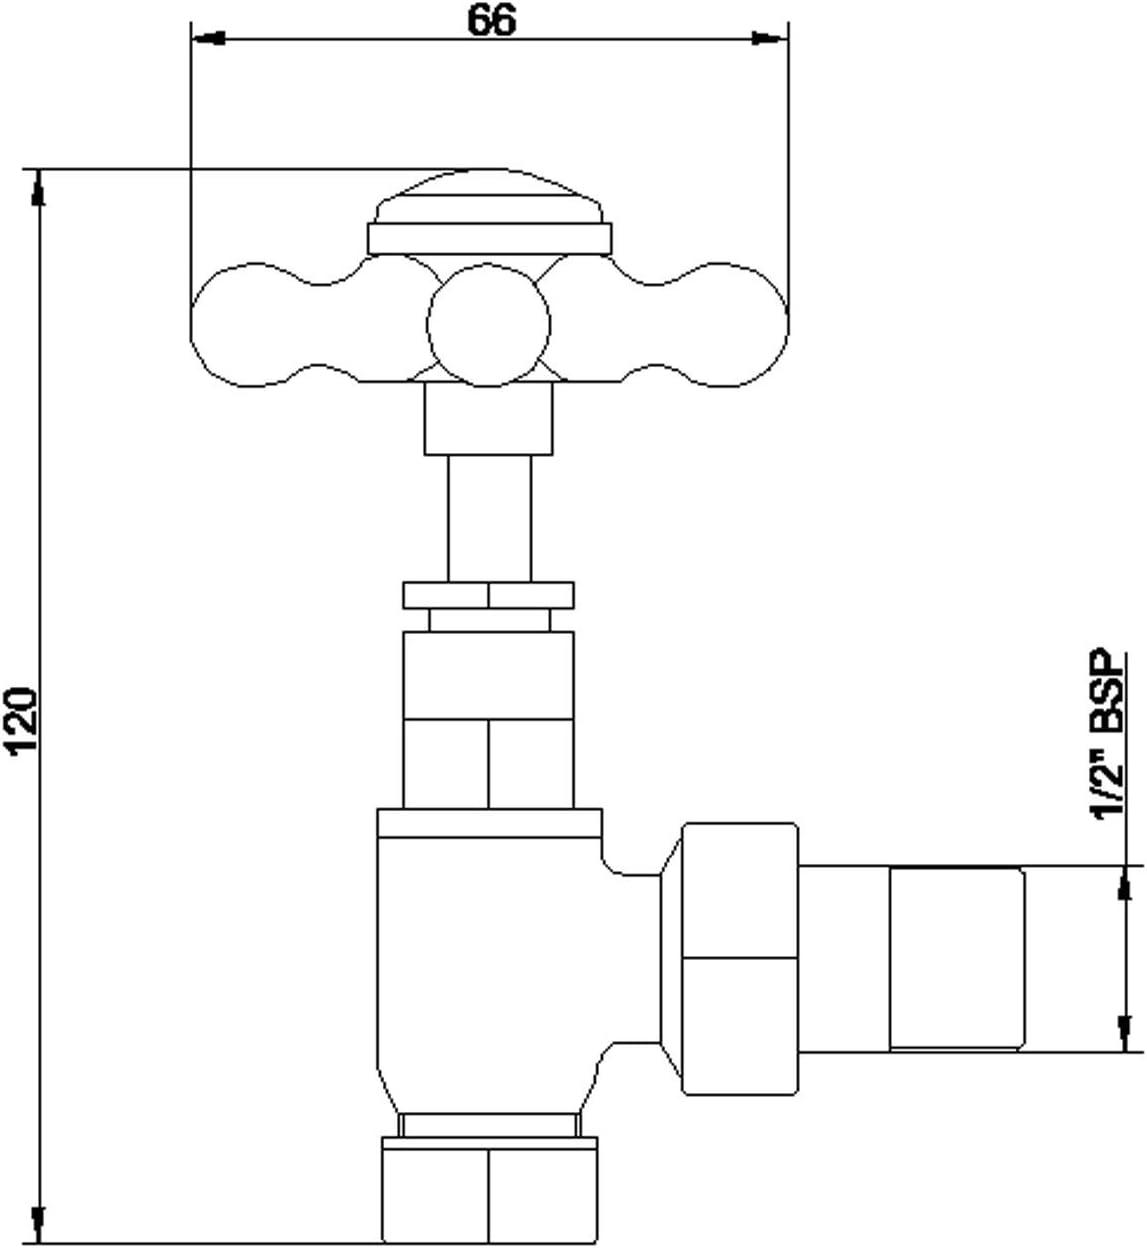 15 mm antikes Messing antikes Messing Home Standard Westminster Heizk/örperventile 1 Paar